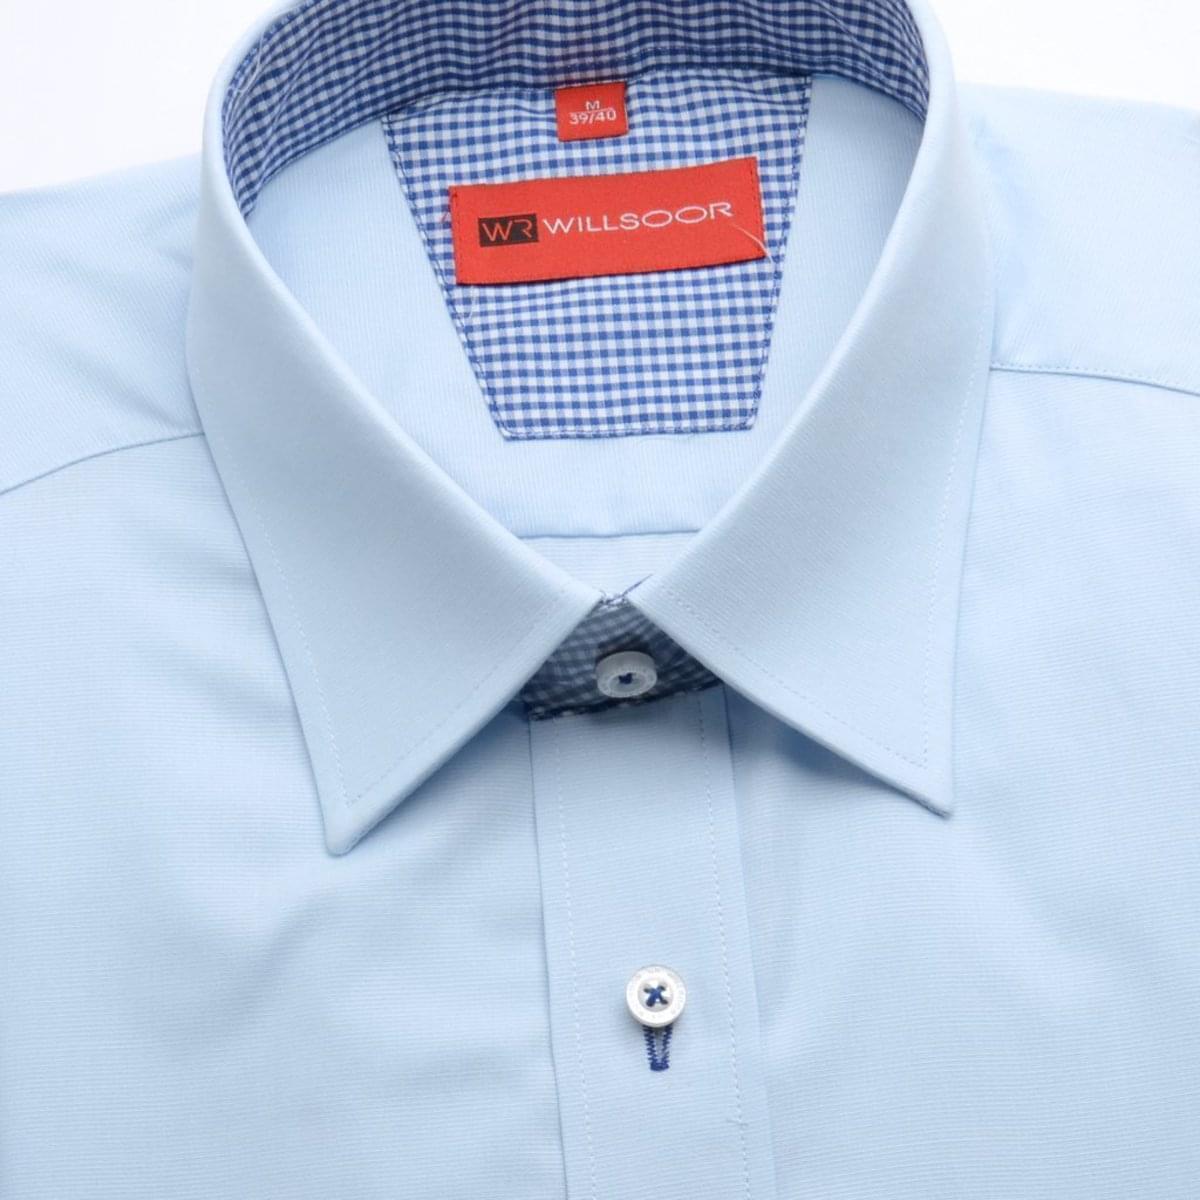 Willsoor Pánská košile WR Slim Fit (výška 164-170) 1717 164-170 / L (41/42)